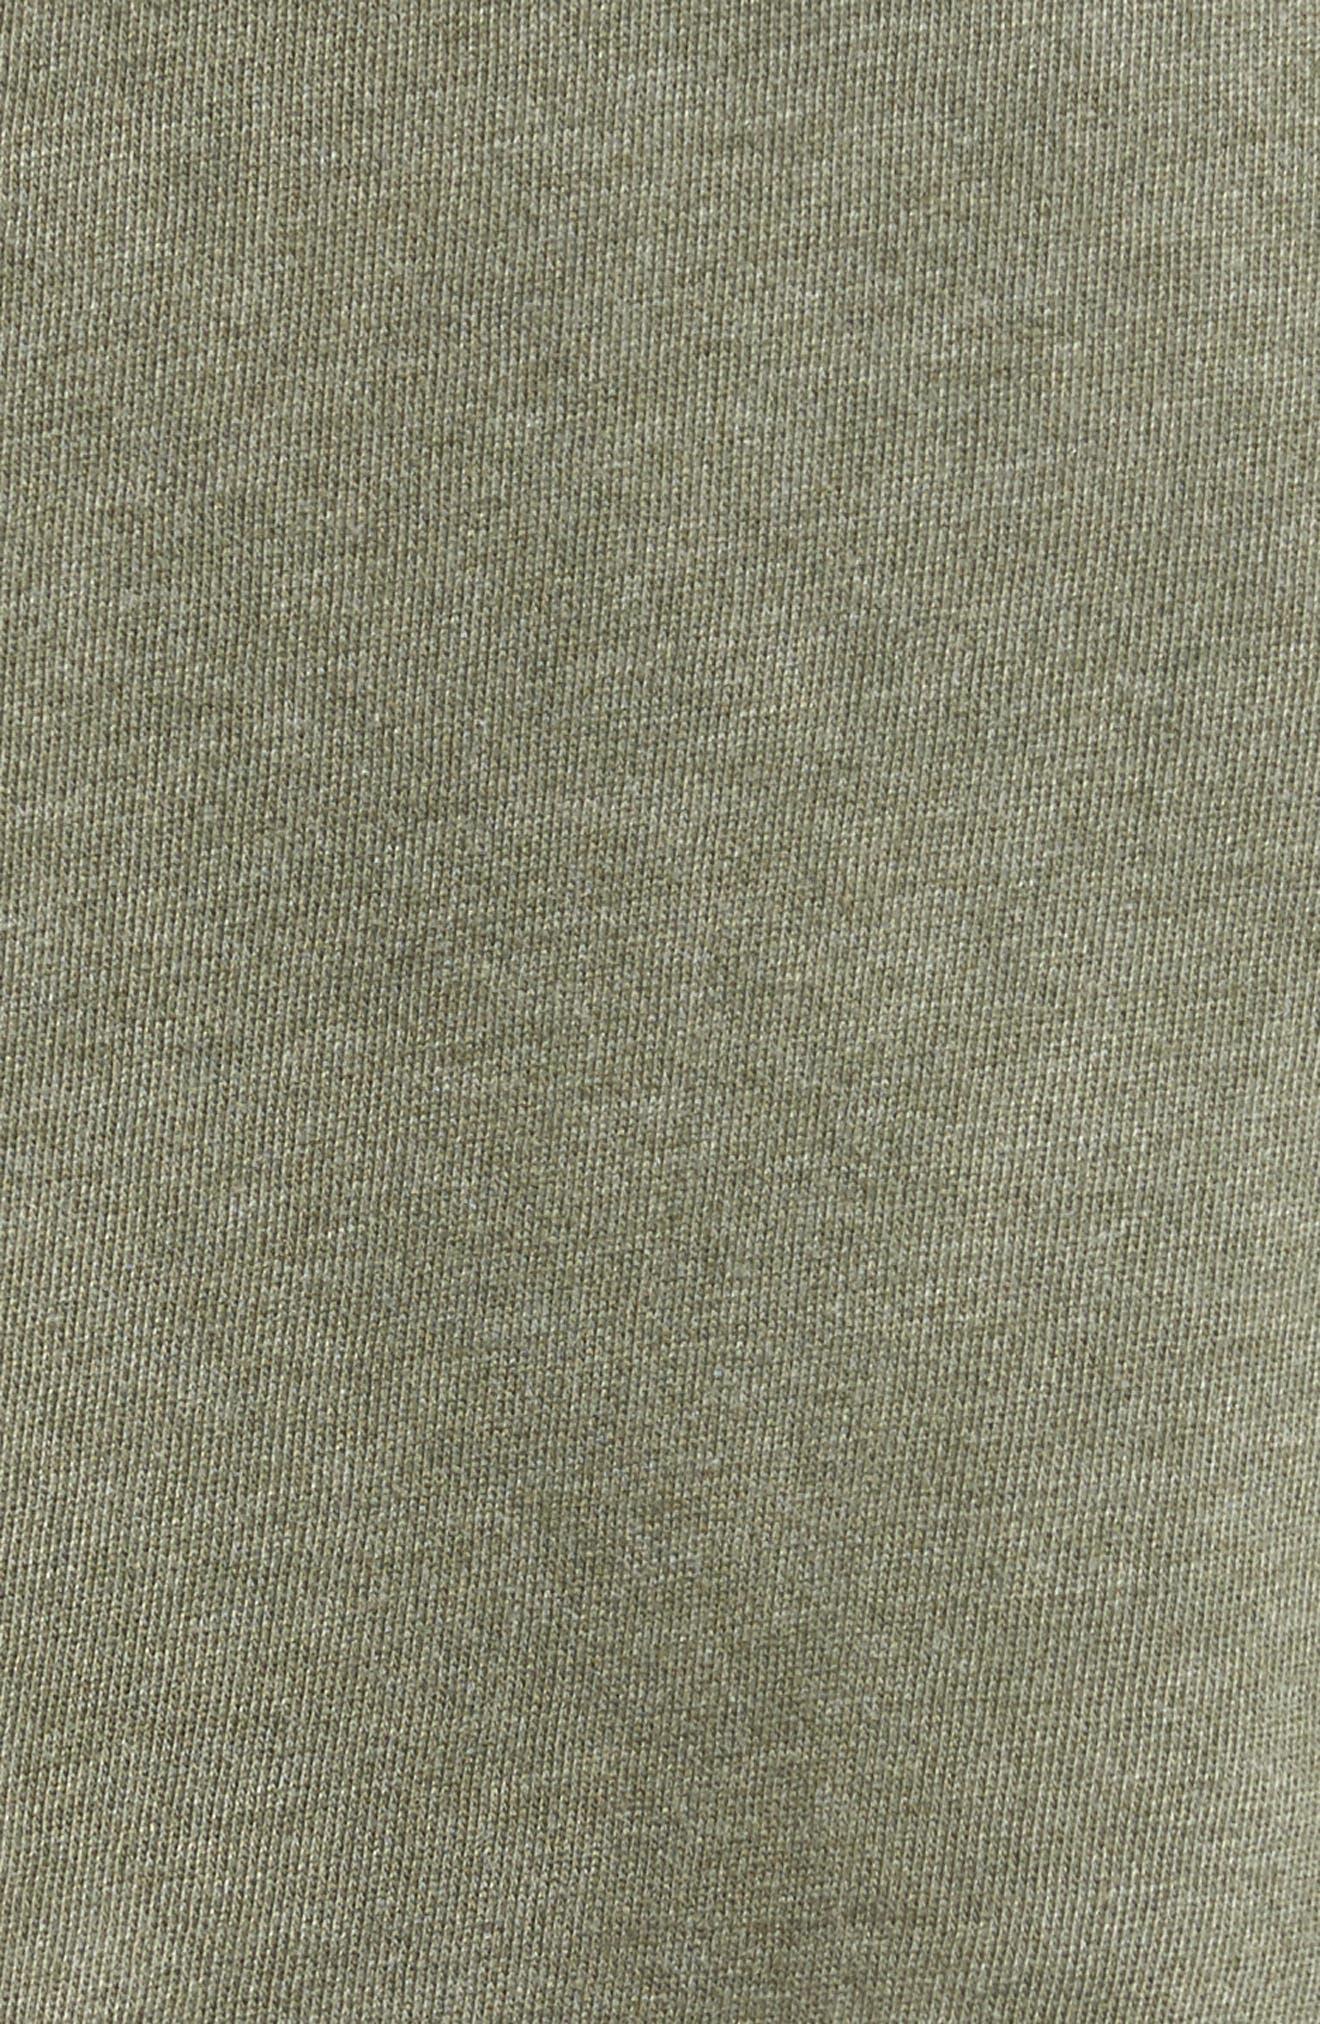 Ripped Sweatshirt Dress,                             Alternate thumbnail 5, color,                             309